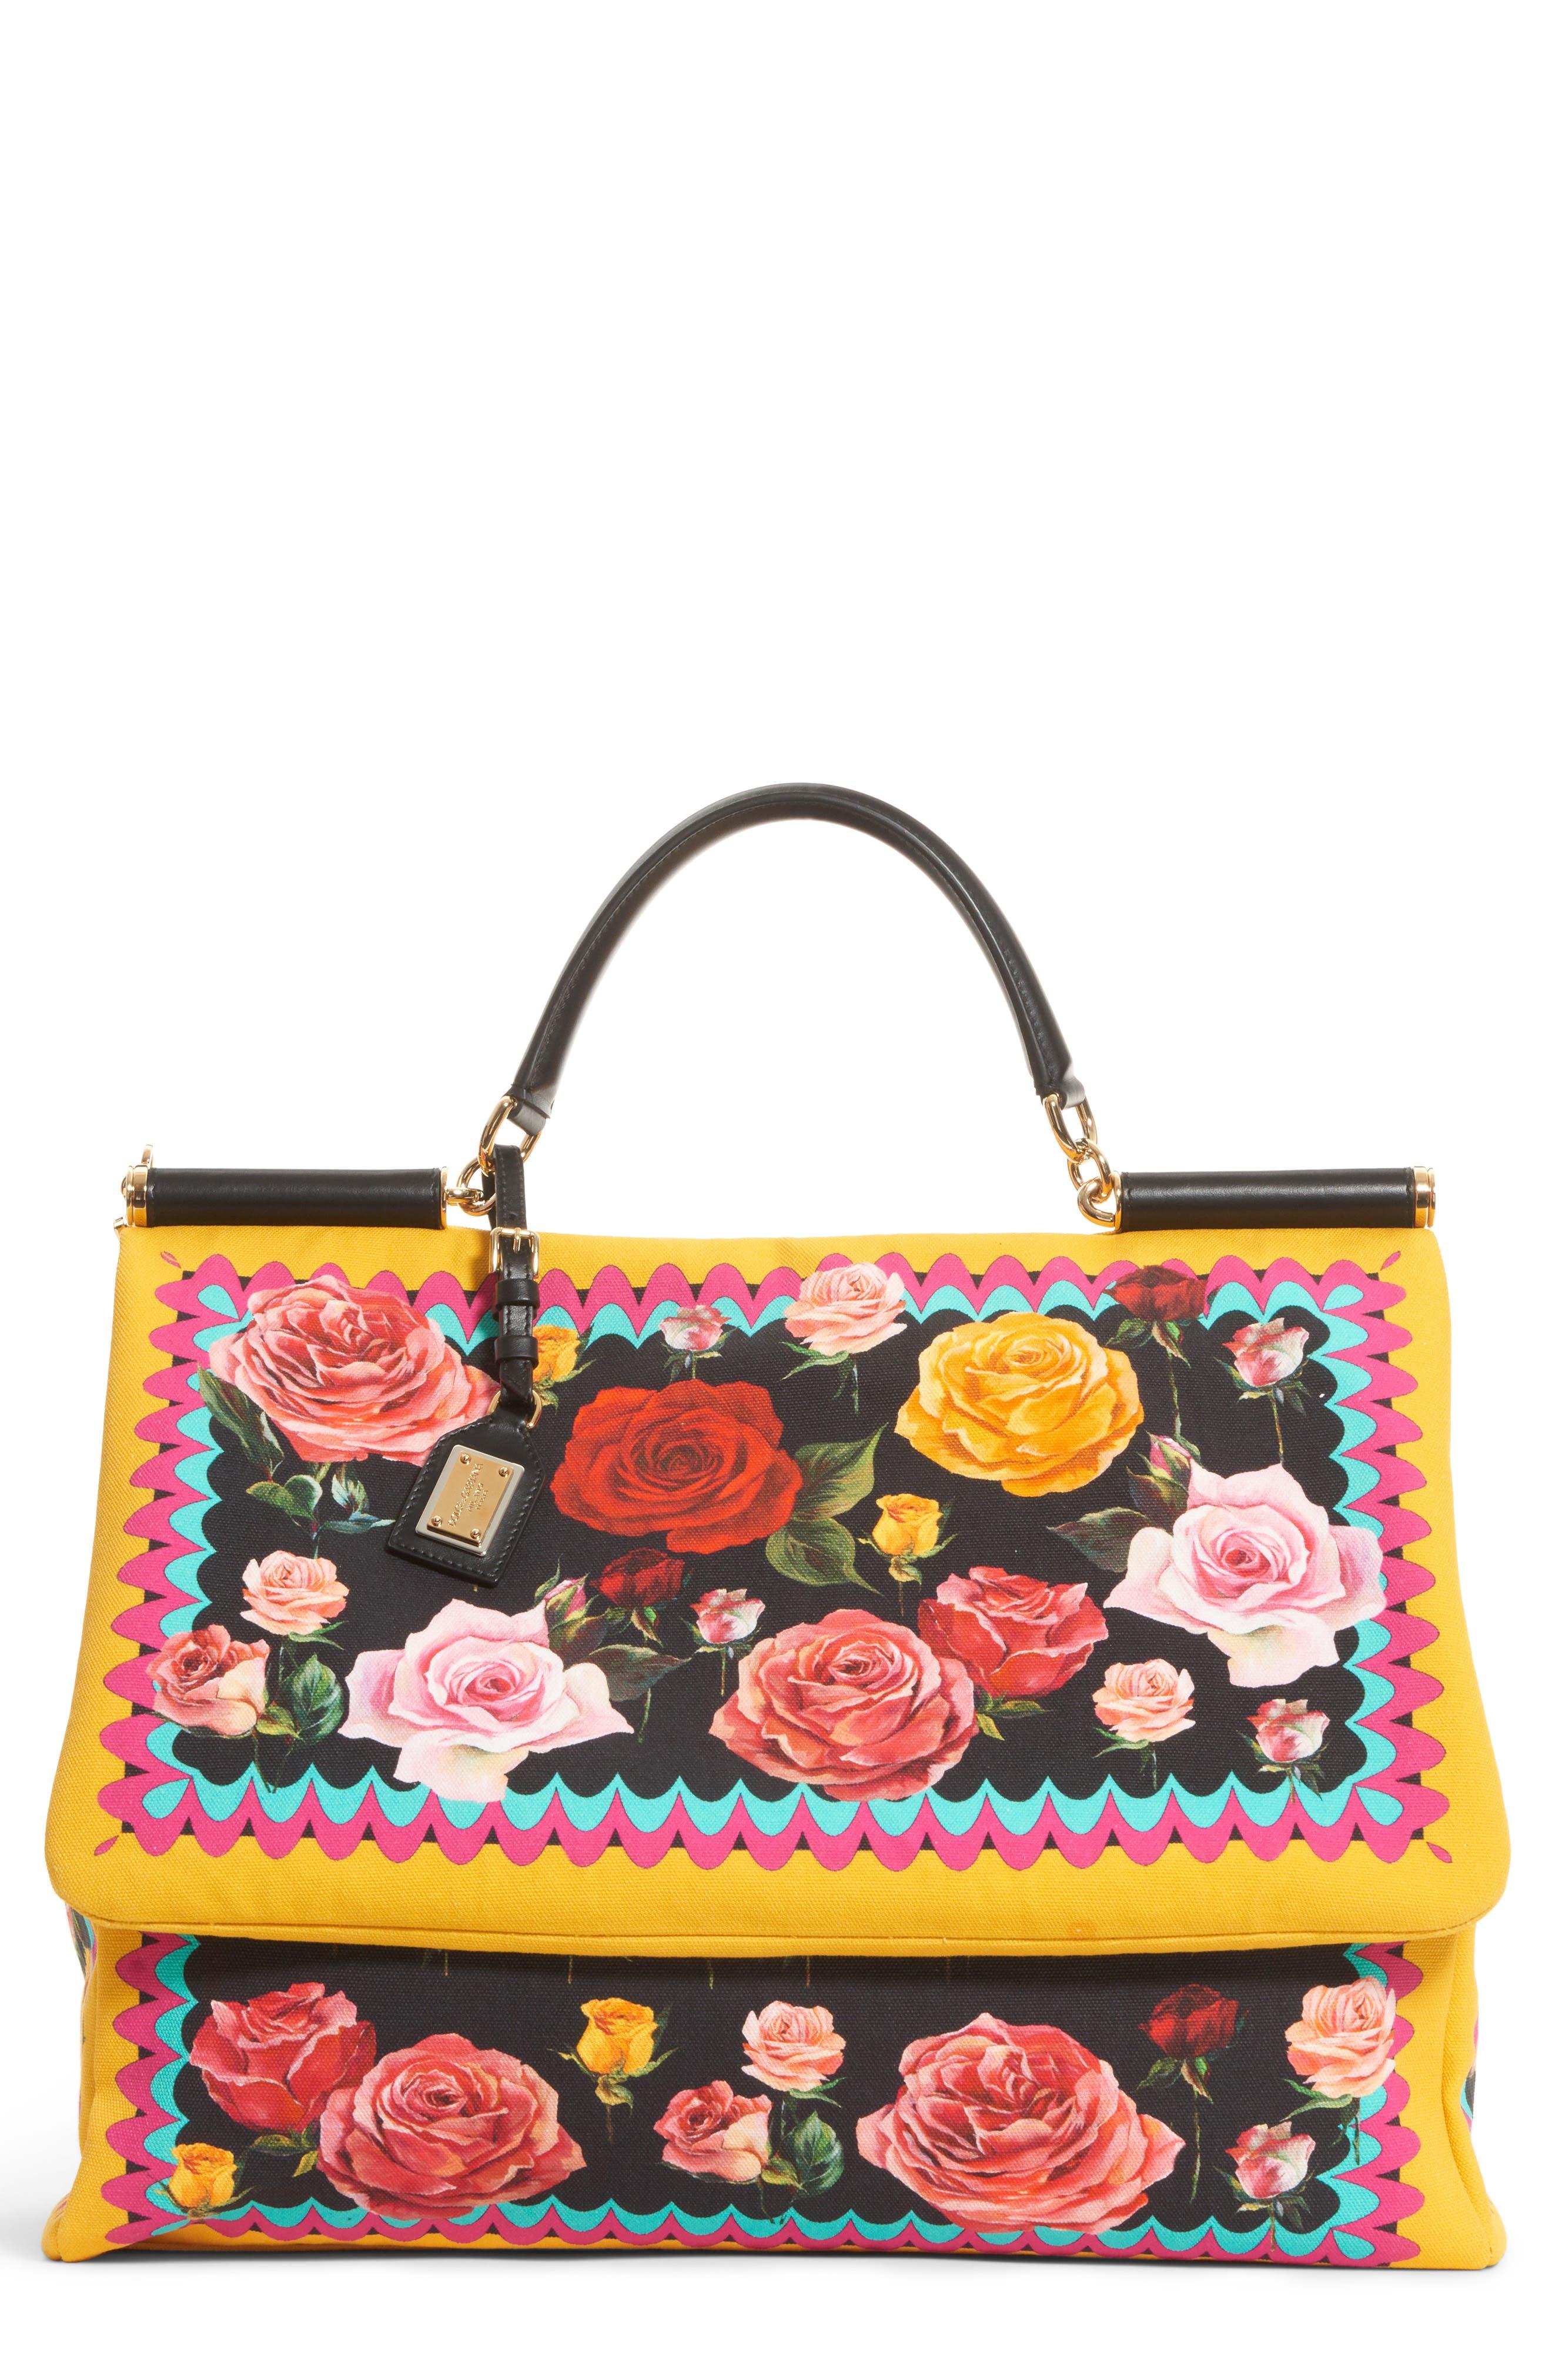 Dolce&Gabbana Miss Sicily Floral Canvas Satchel